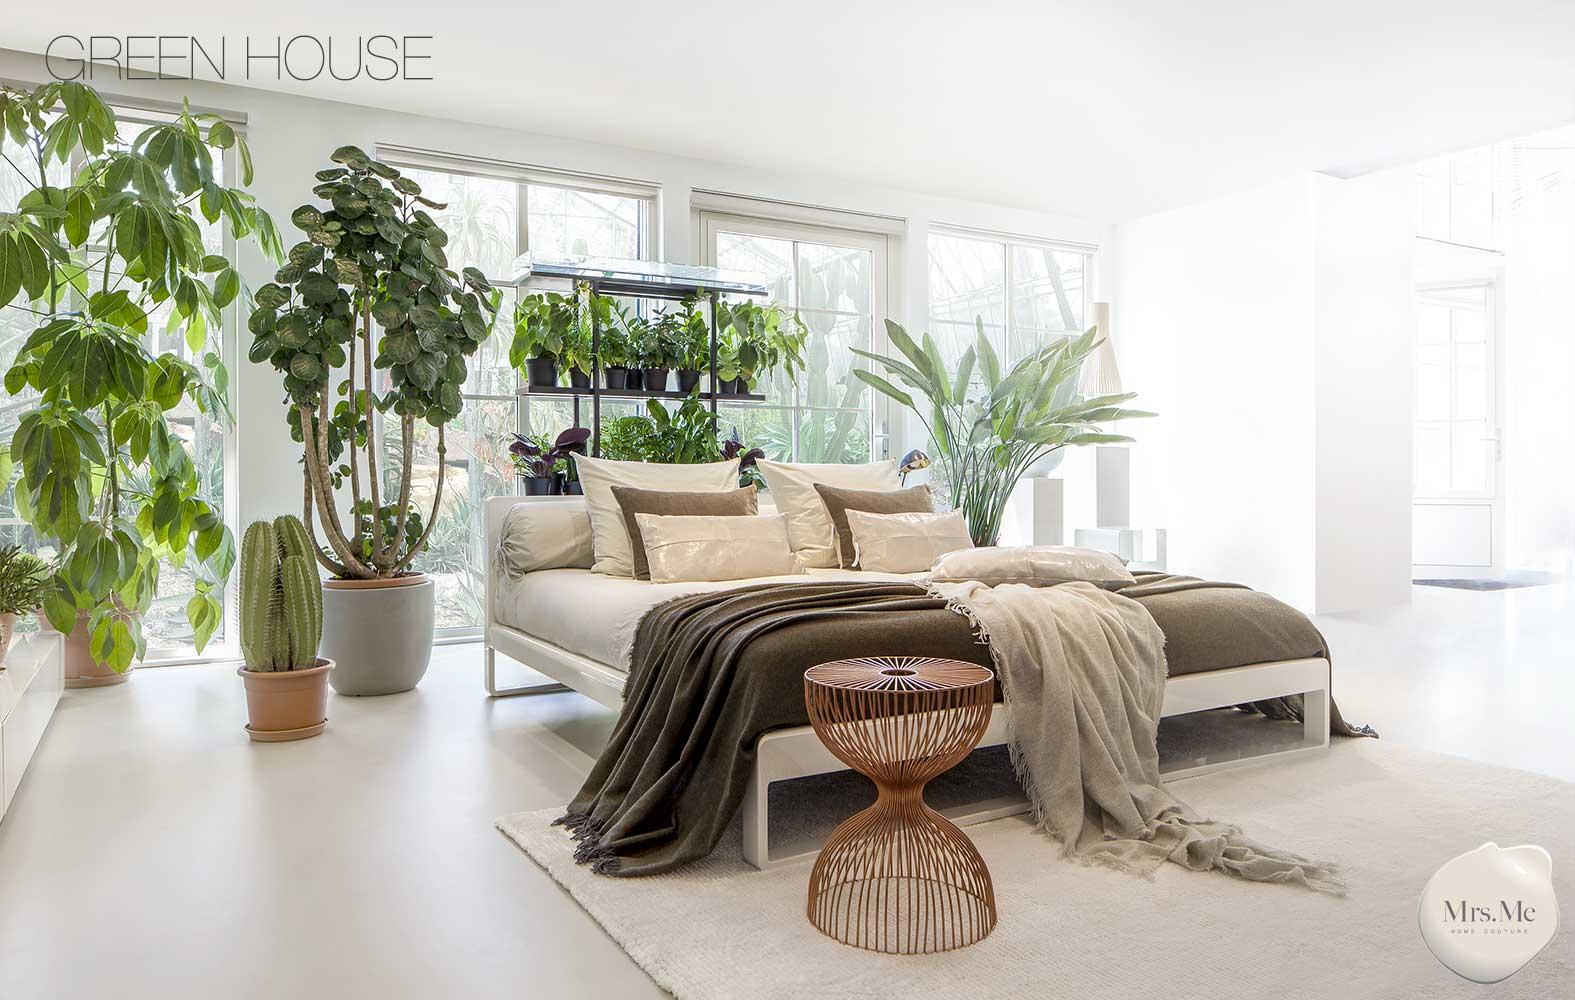 MrsMe-TheGlassHouse-GreenHouse